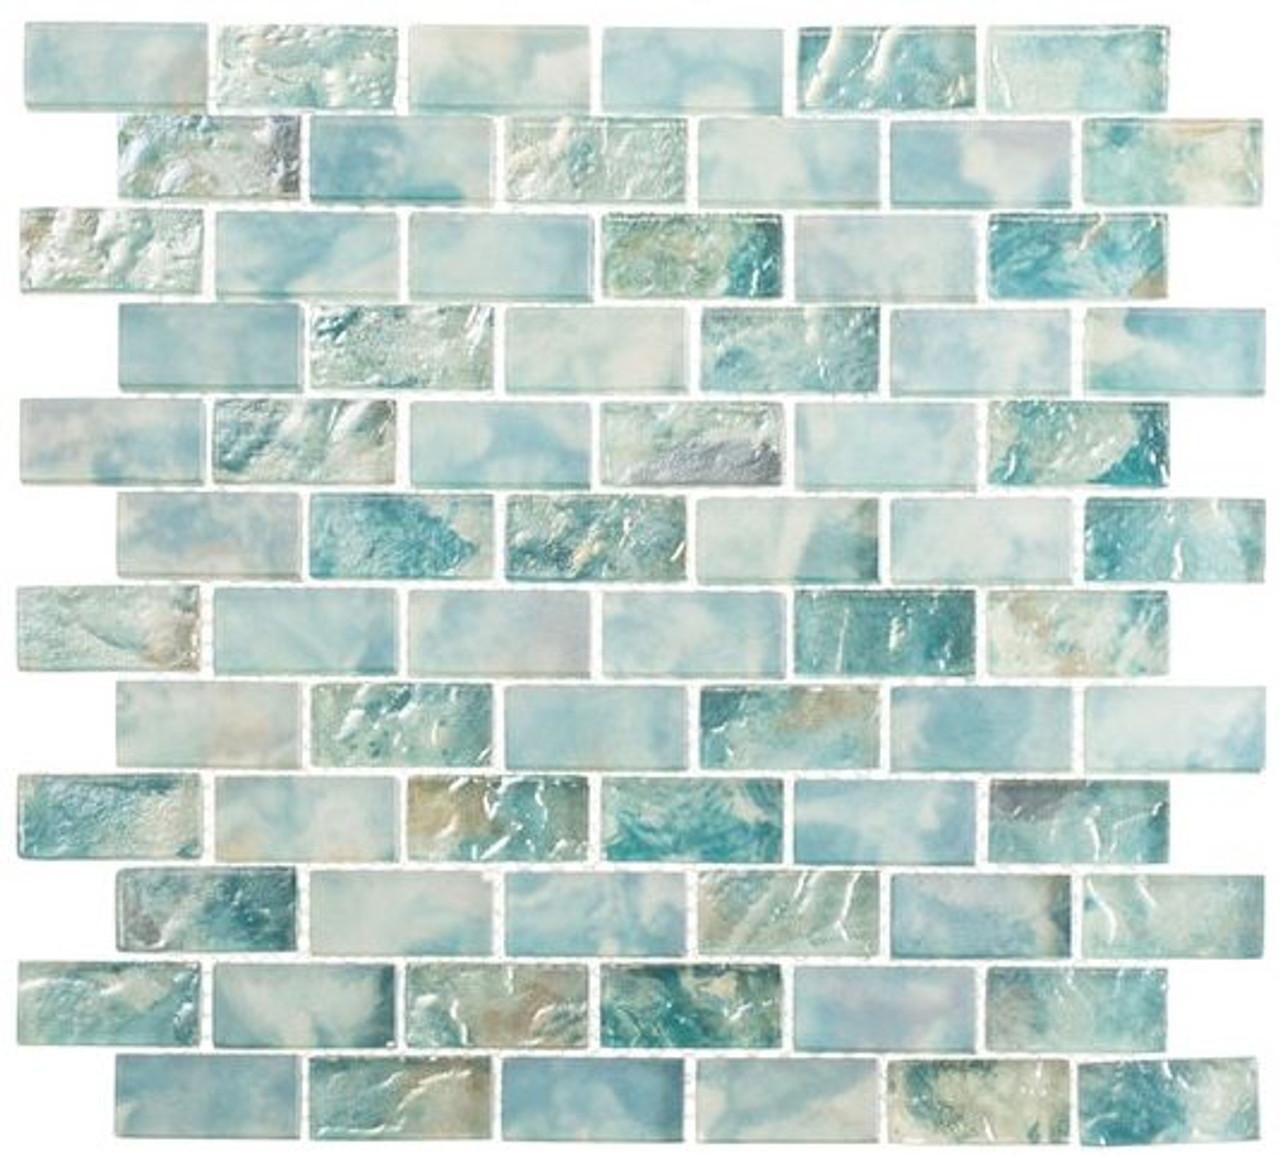 Bella Glass Tiles Mykonos Harbor Series Beach Day